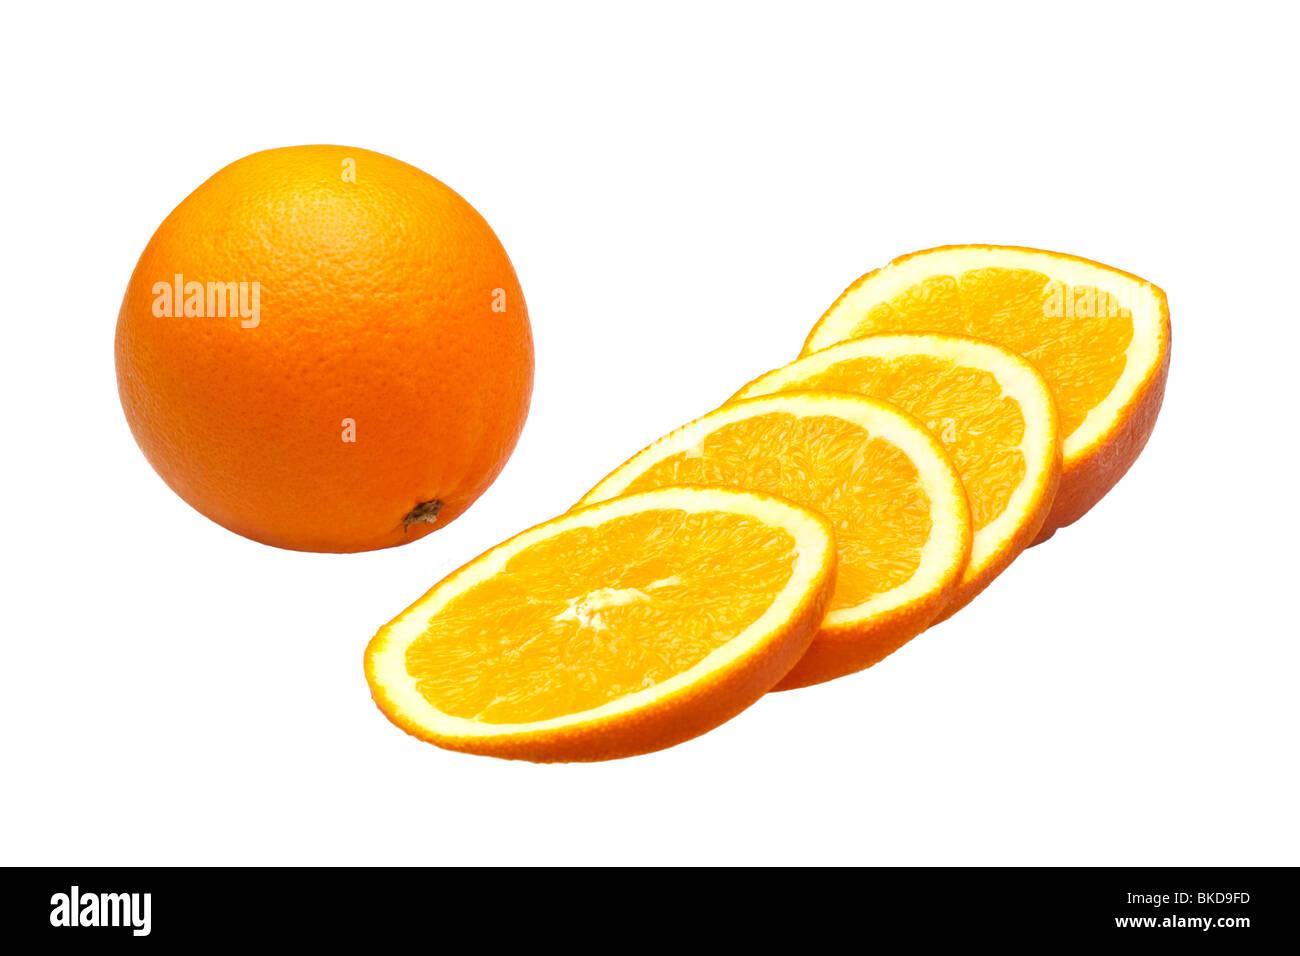 Oranges whole and sliced on white - Stock Image